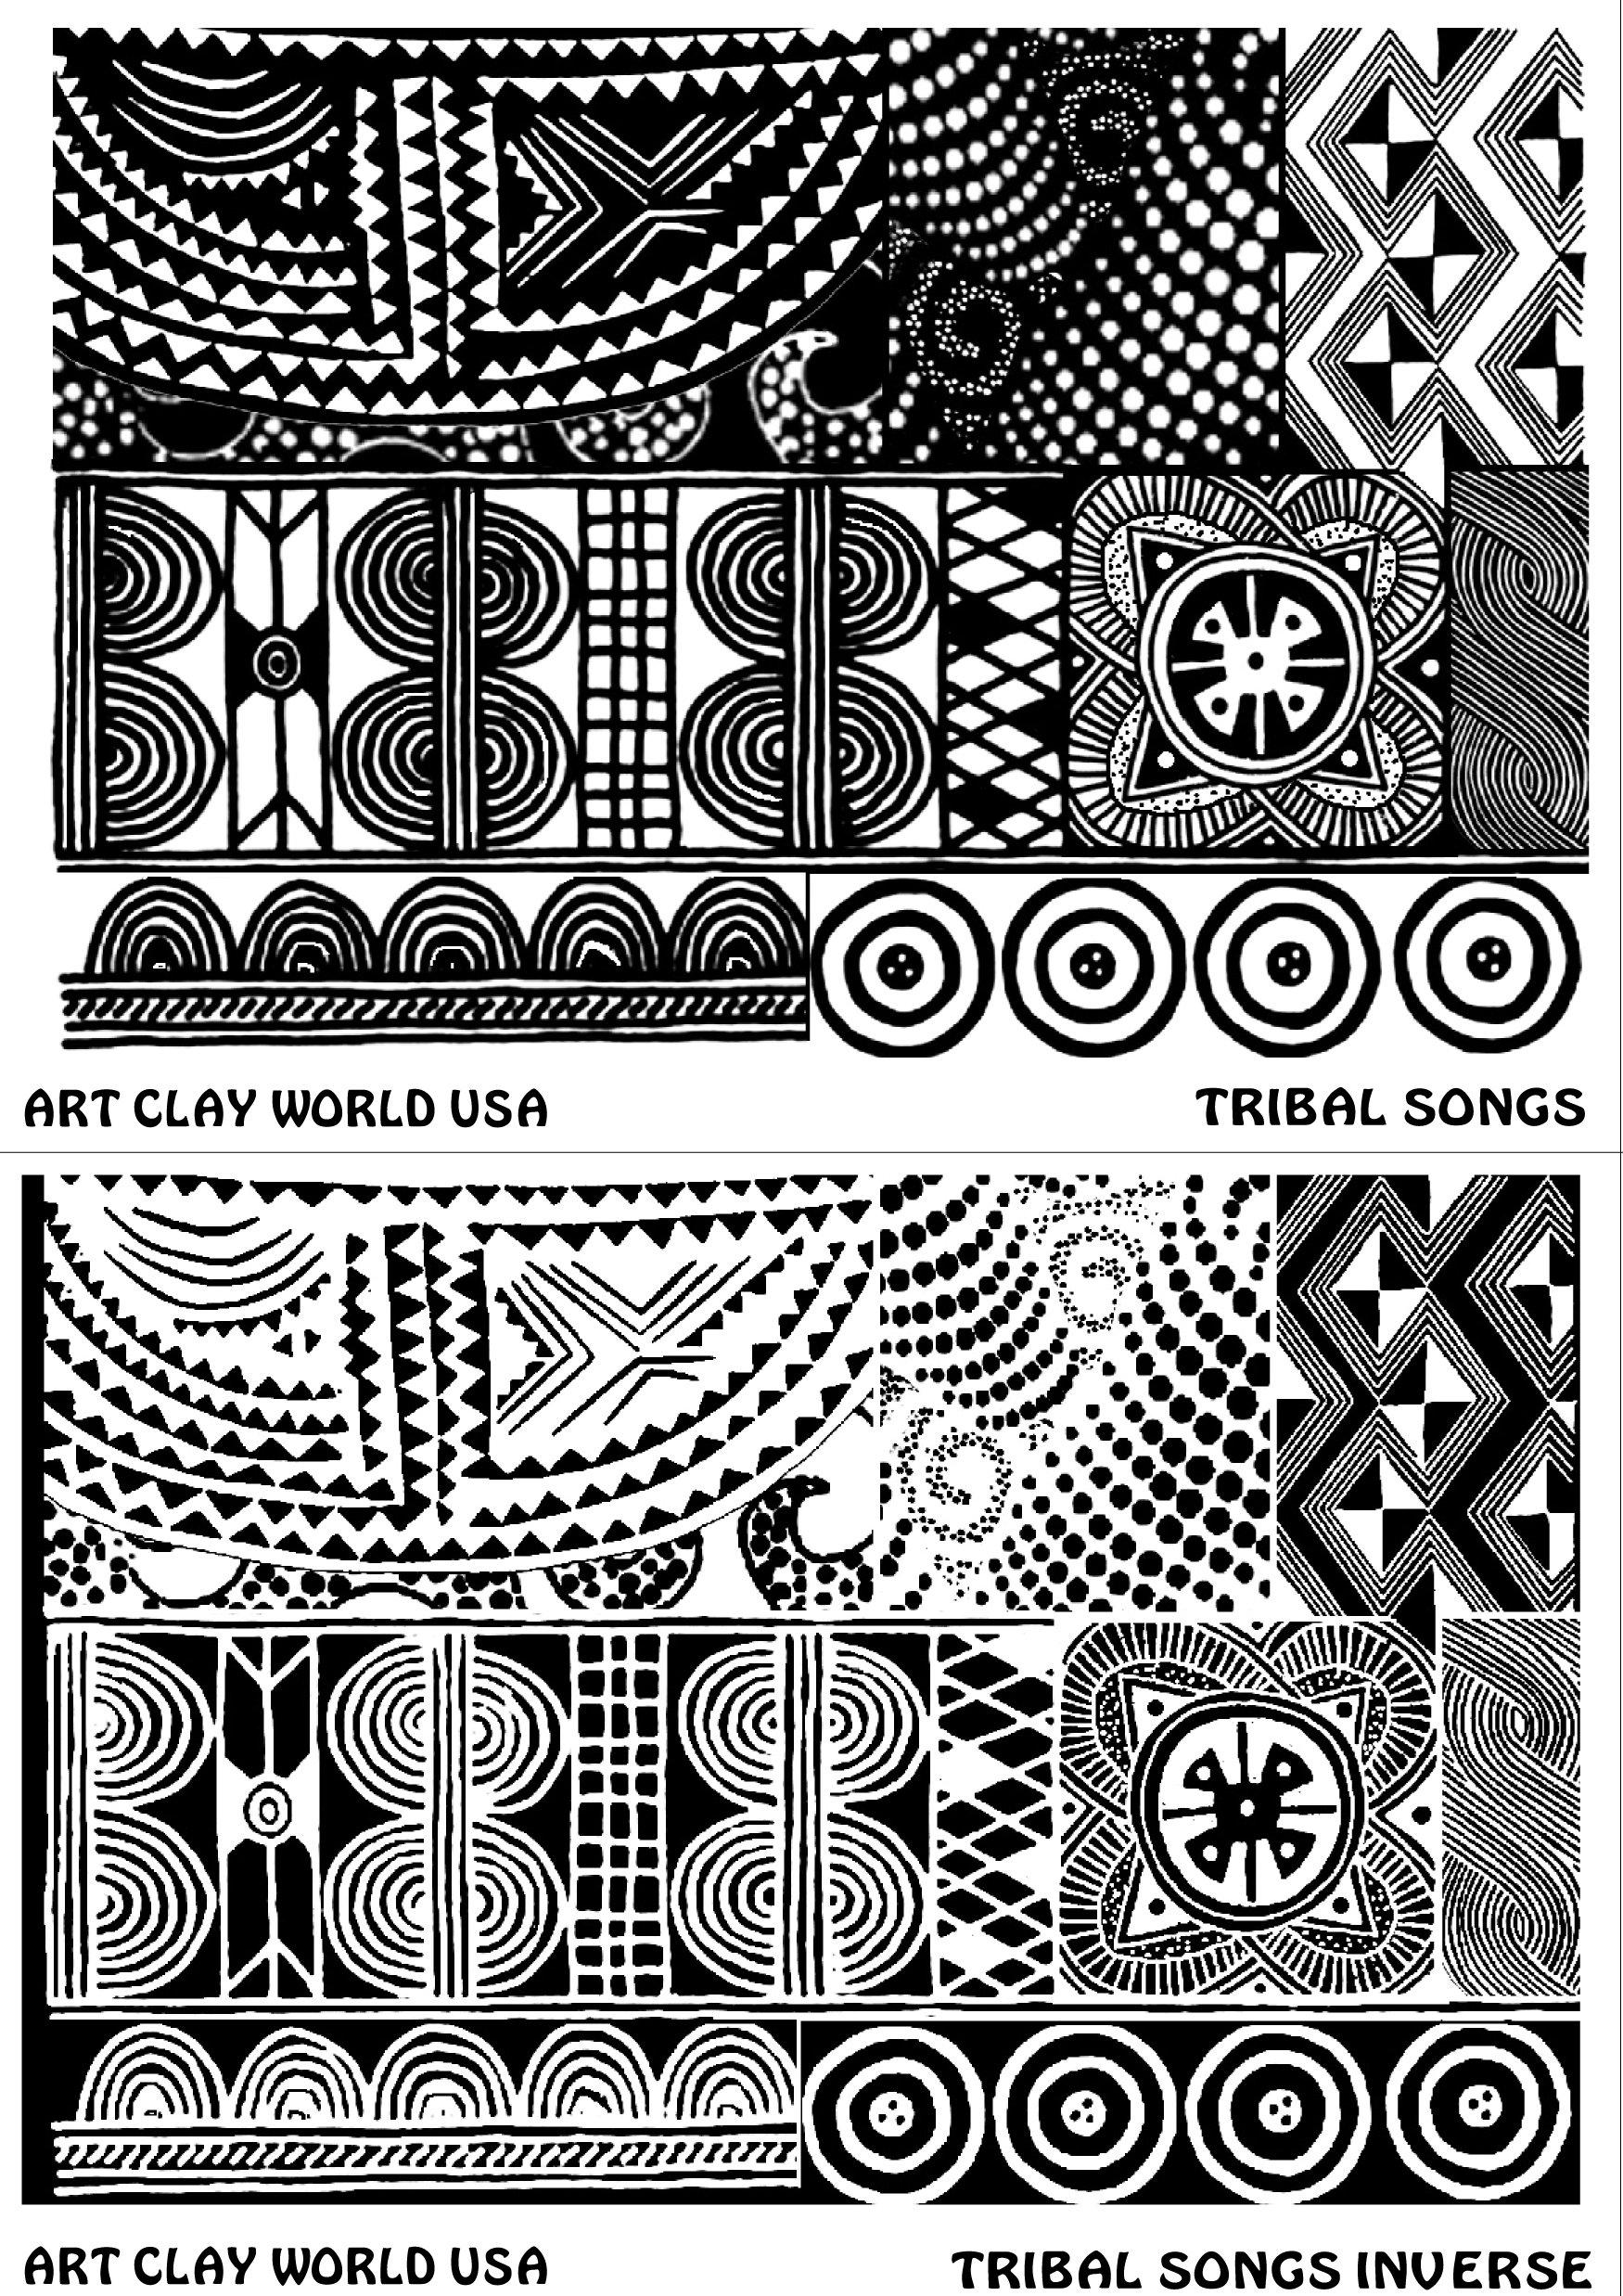 FlexiStamps Texture Sheet Set Tribal Songs Designs (Including Tribal Songs and Tribal Songs Inverse)- 2 pc.